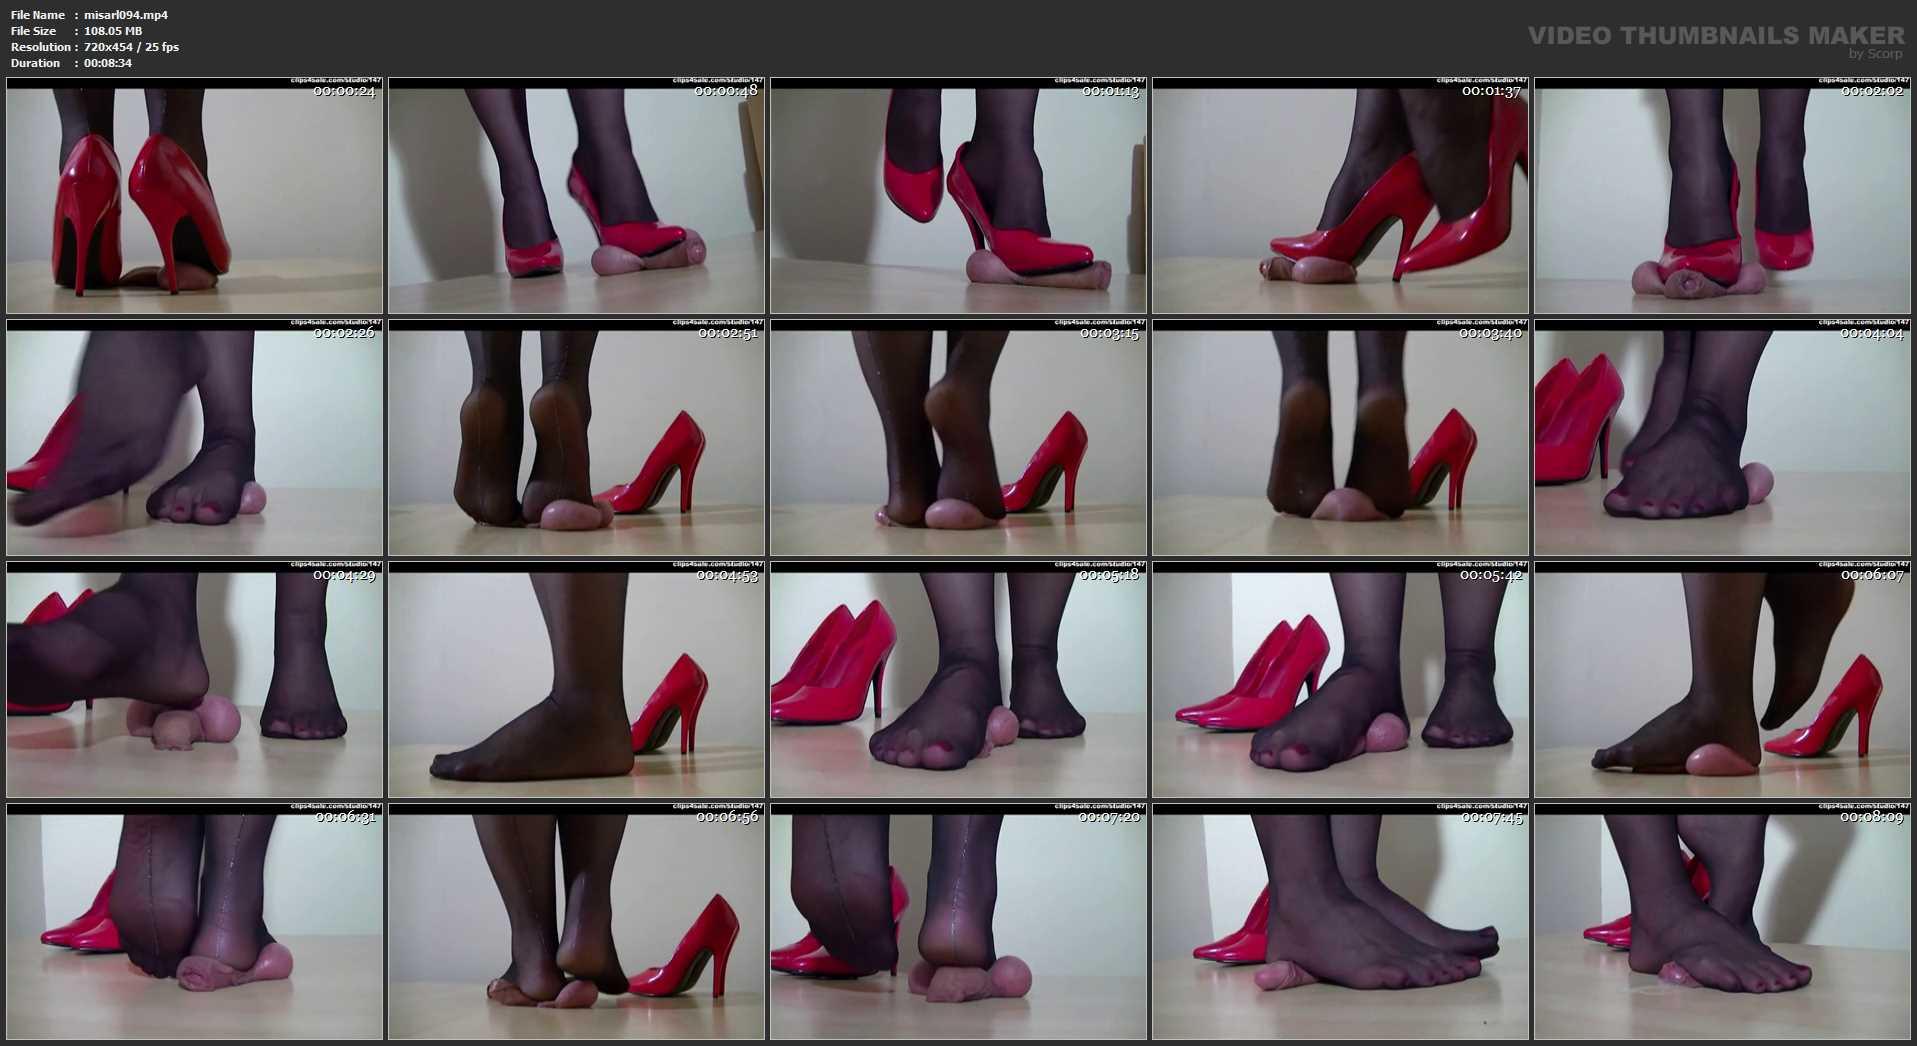 Mistress Arletta In Scene: UNDER RED STILETTOS - A BALLS AND COCK TRAMPLE - SD/454p/MP4